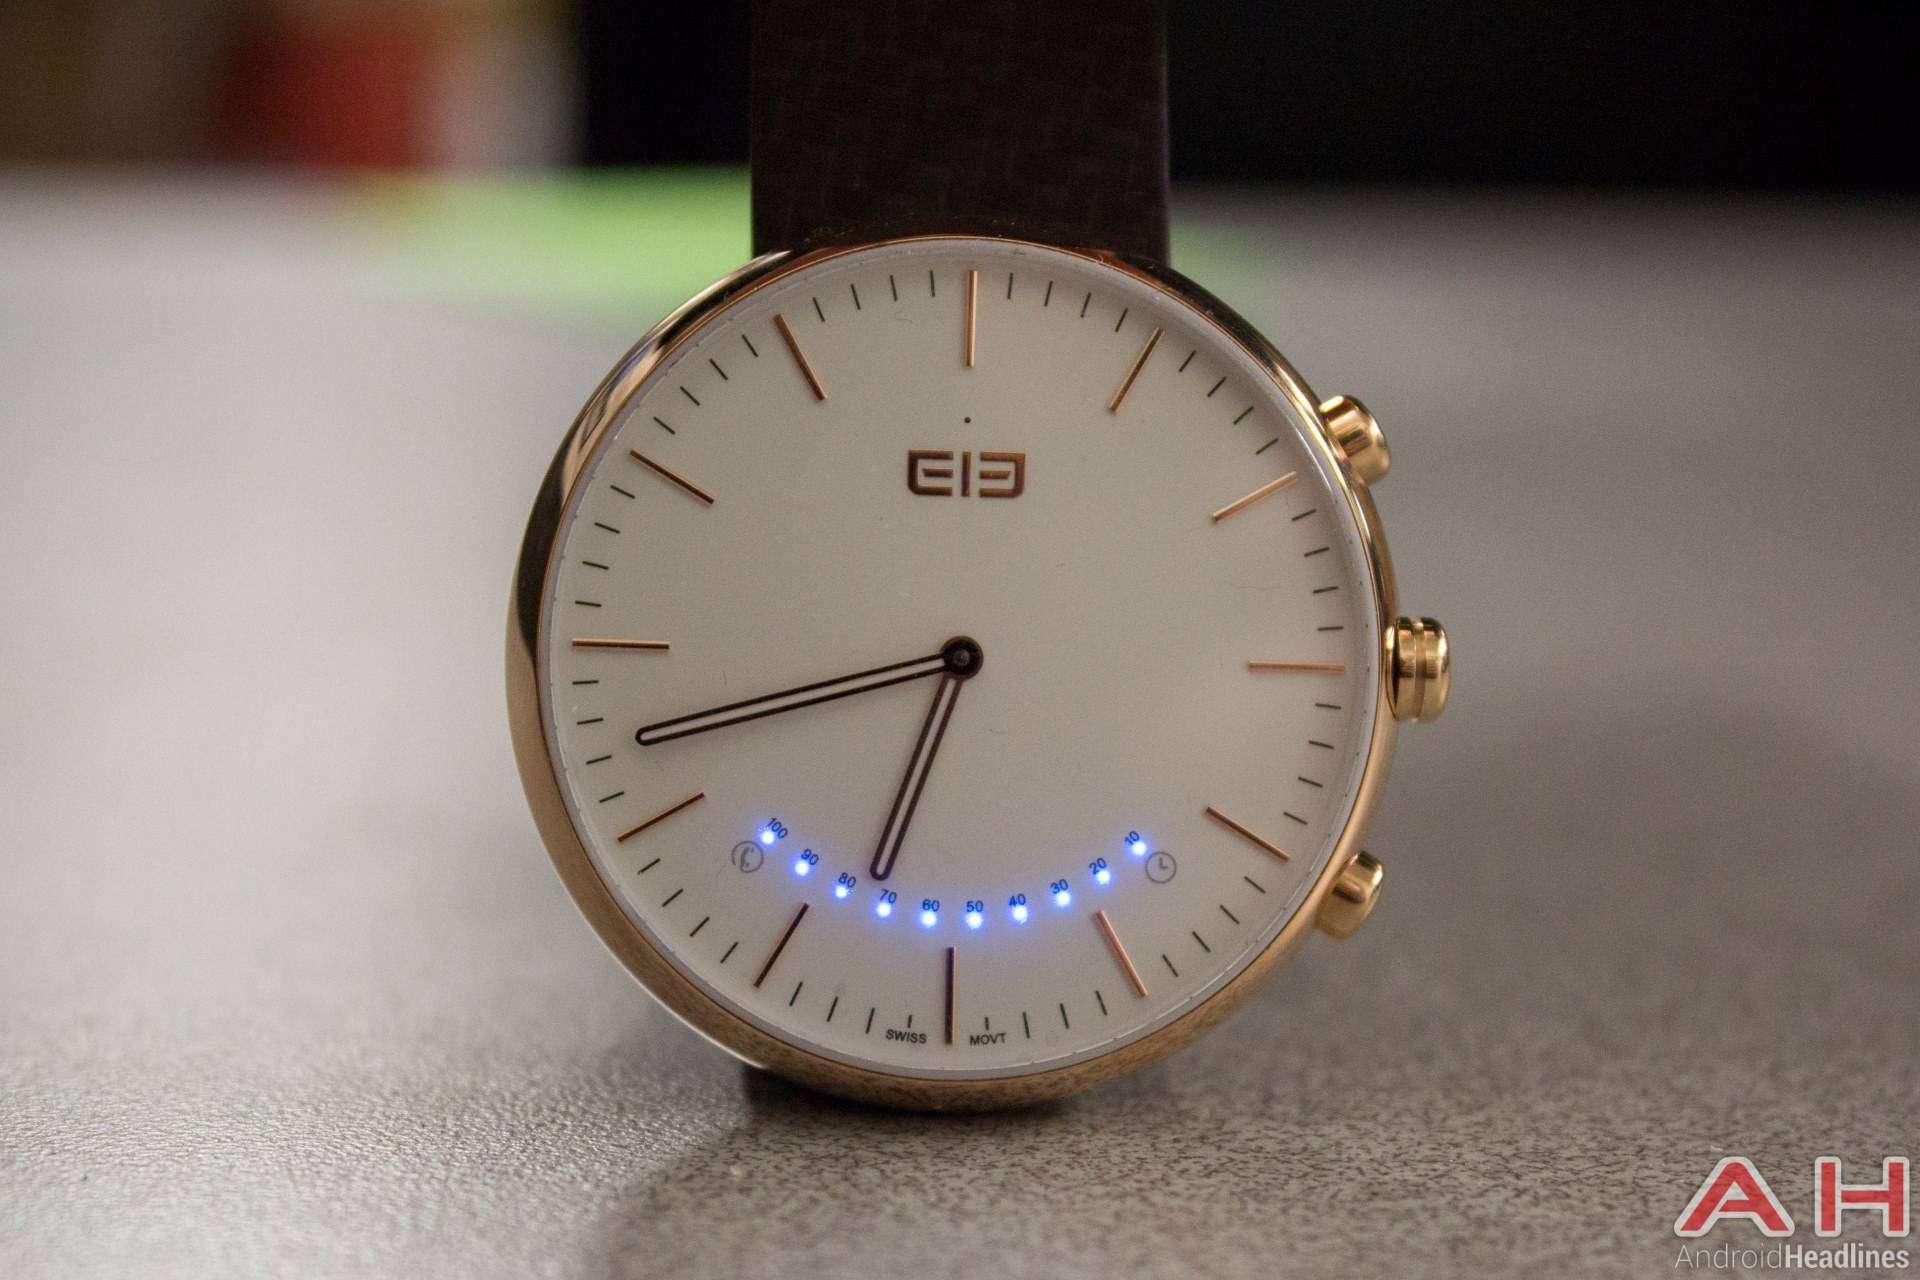 Elephone-W2-Watch-AH-NS-13